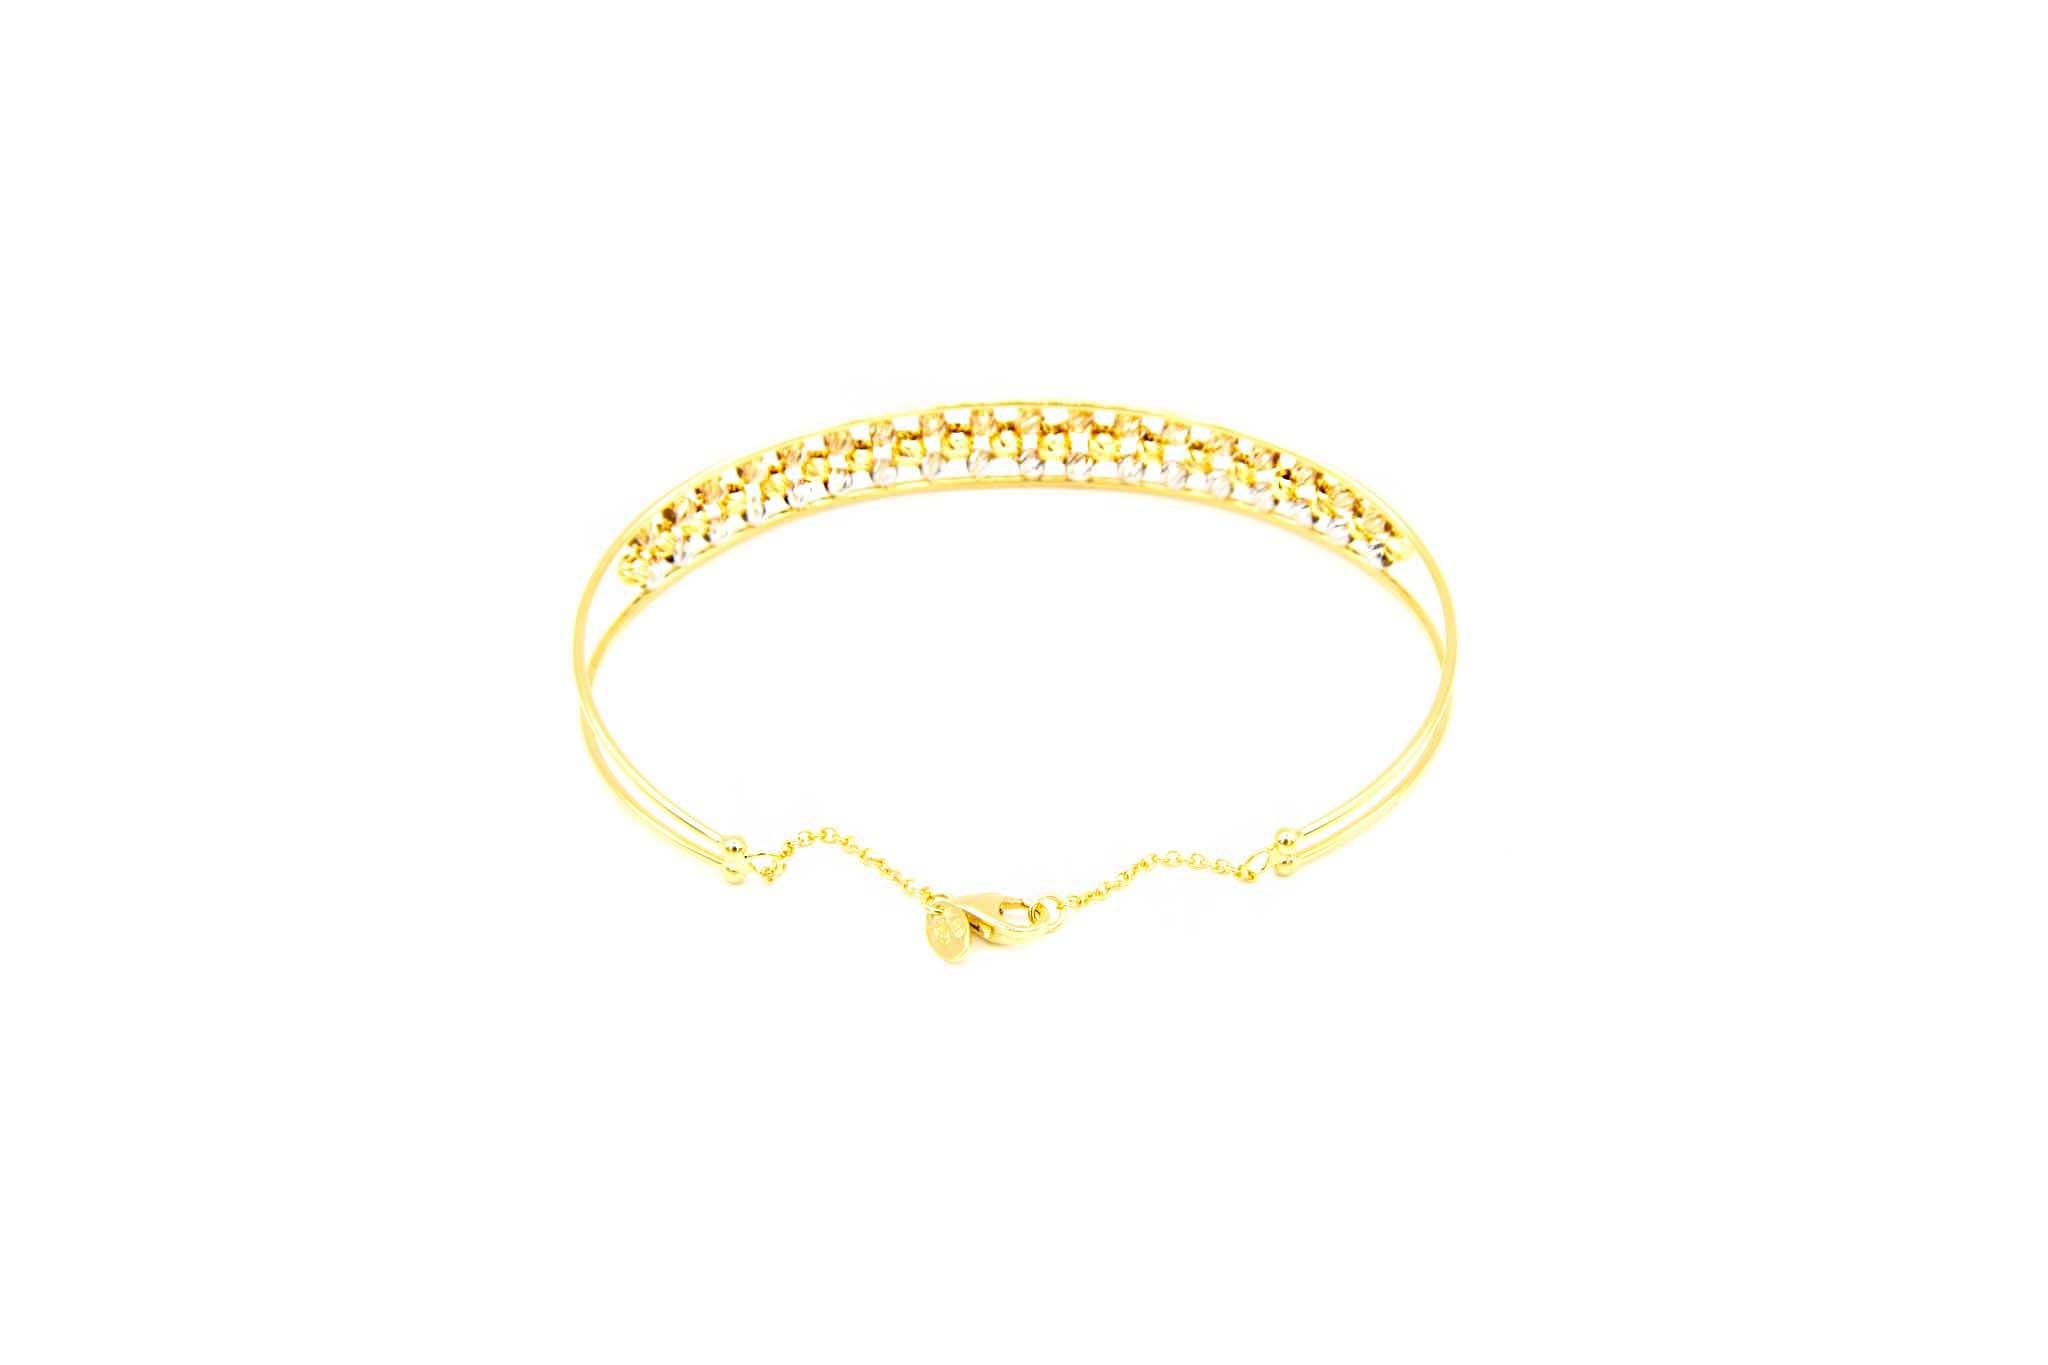 Armband opengewerkte band gevuld met diamond cut balletjes-5